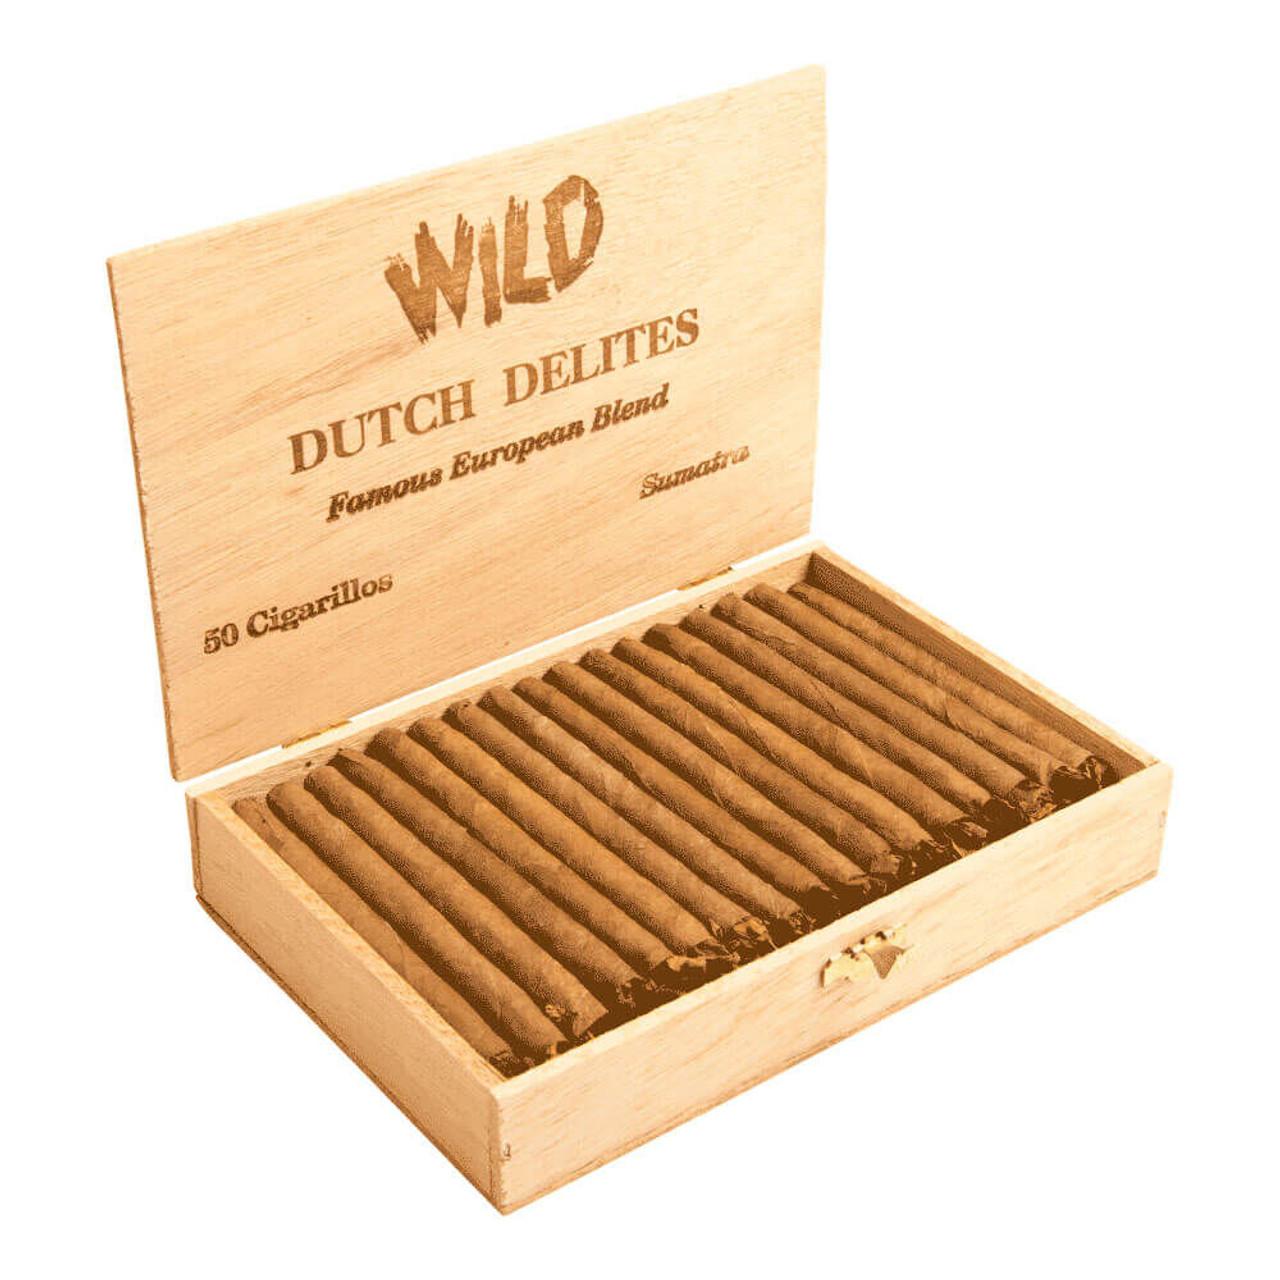 Dutch Delites Wild Sumatra Cigars - 5 x 30 (Box of 50)